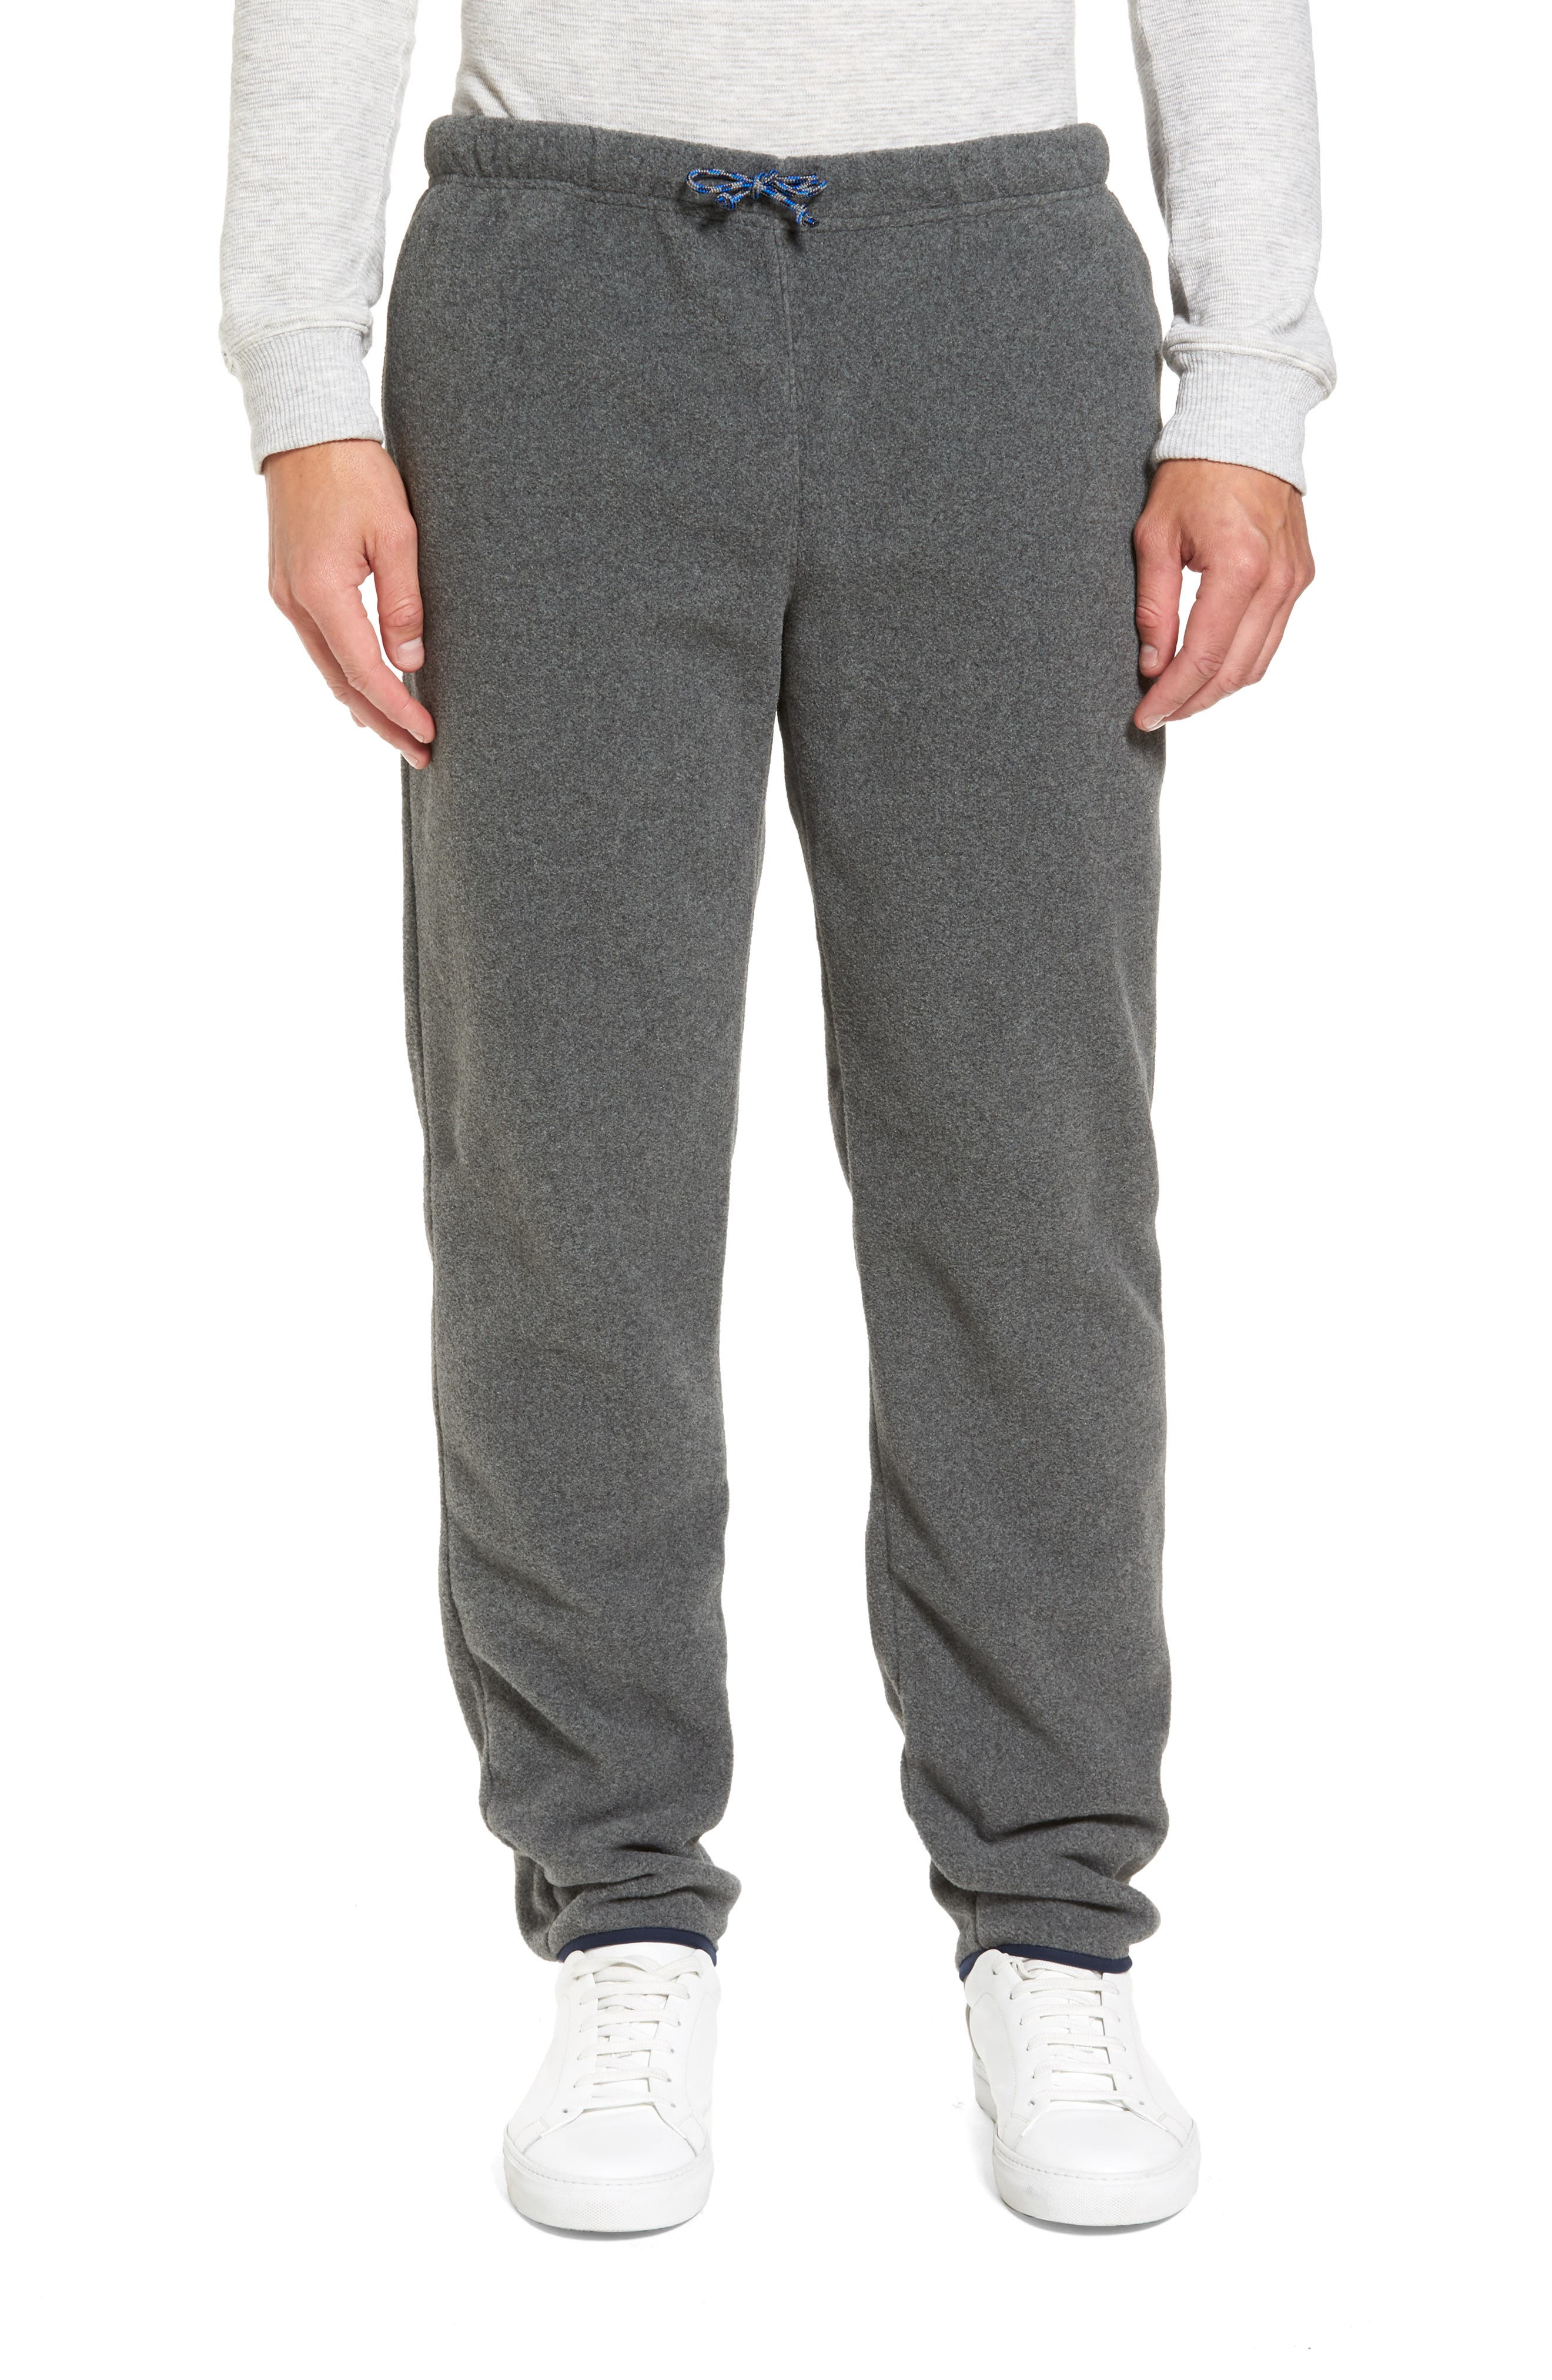 Alternate Image 1 Selected - Patagonia Synchilla® Fleece Pants